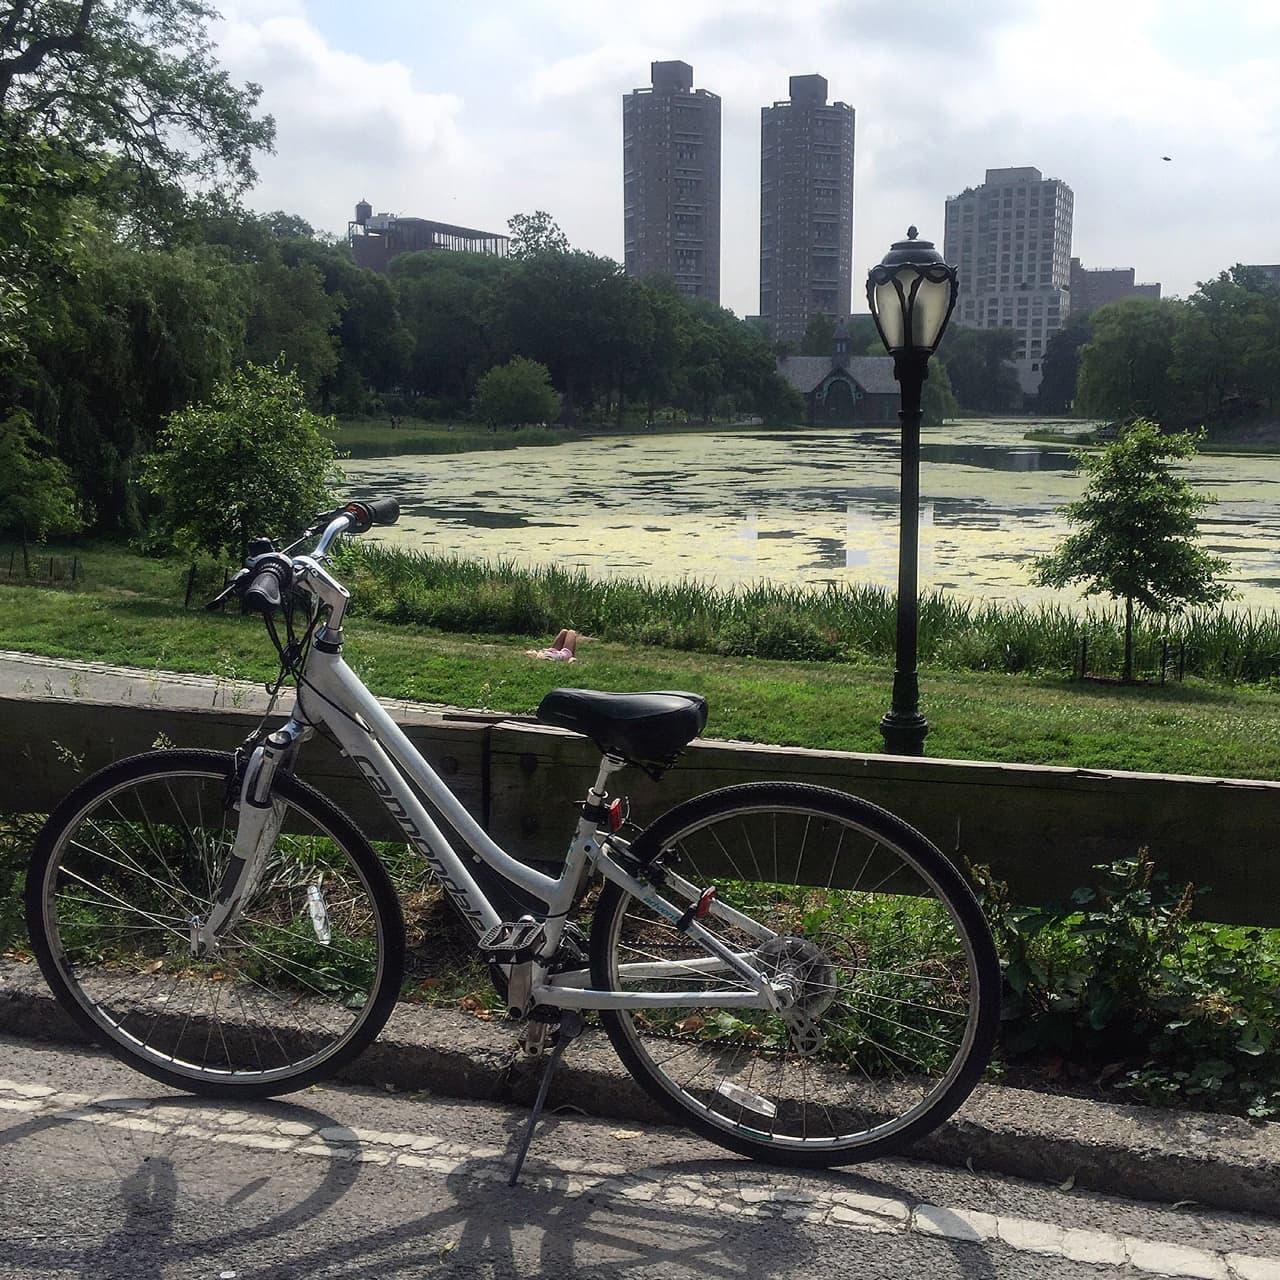 Fun Times Biking in Central Park + A Discount Code!